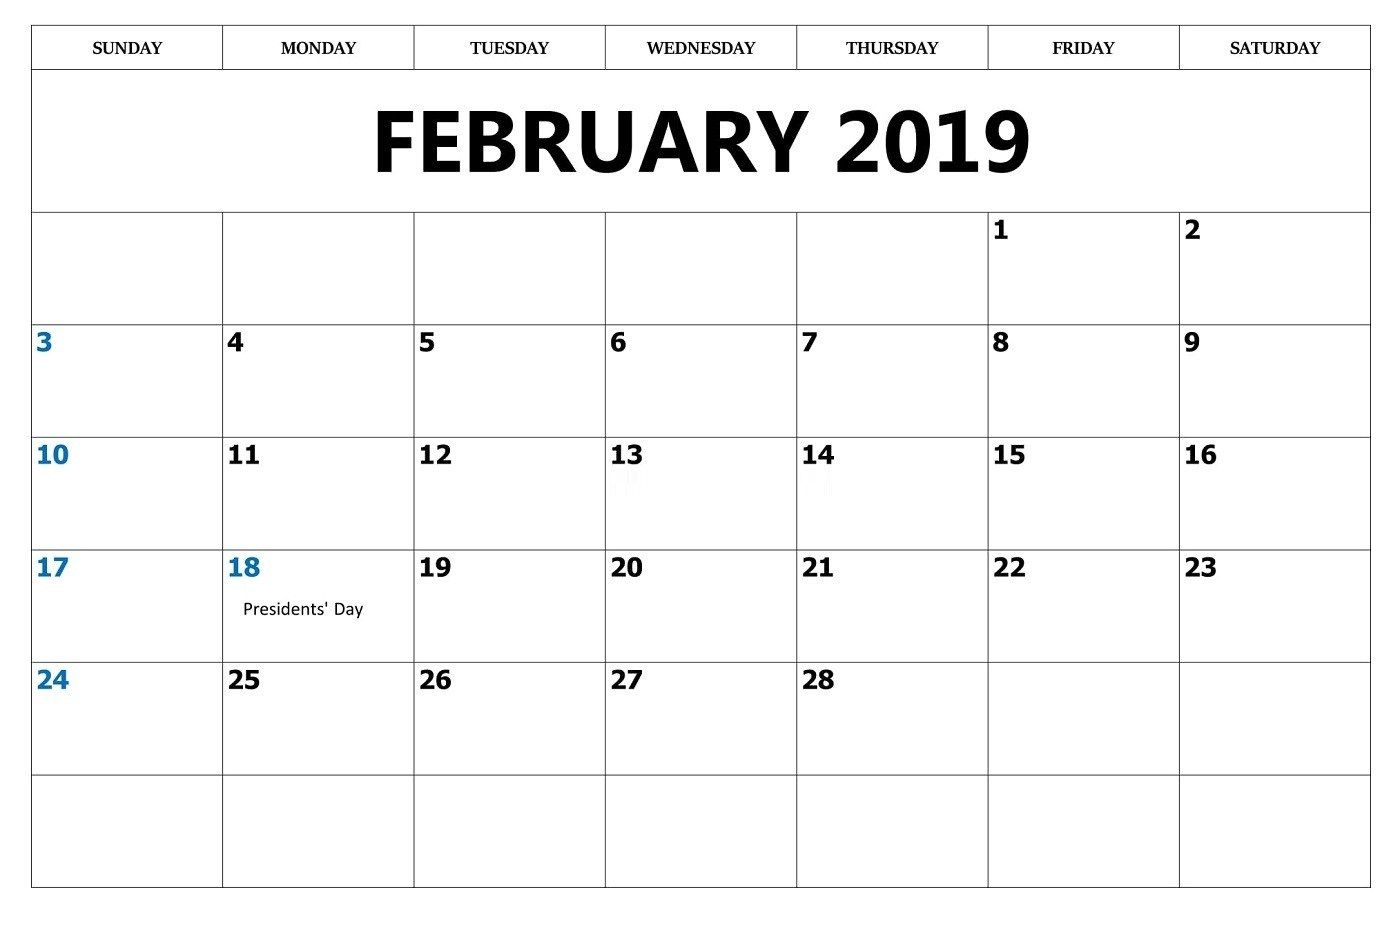 February 2019 Calendar Printable With Holidays